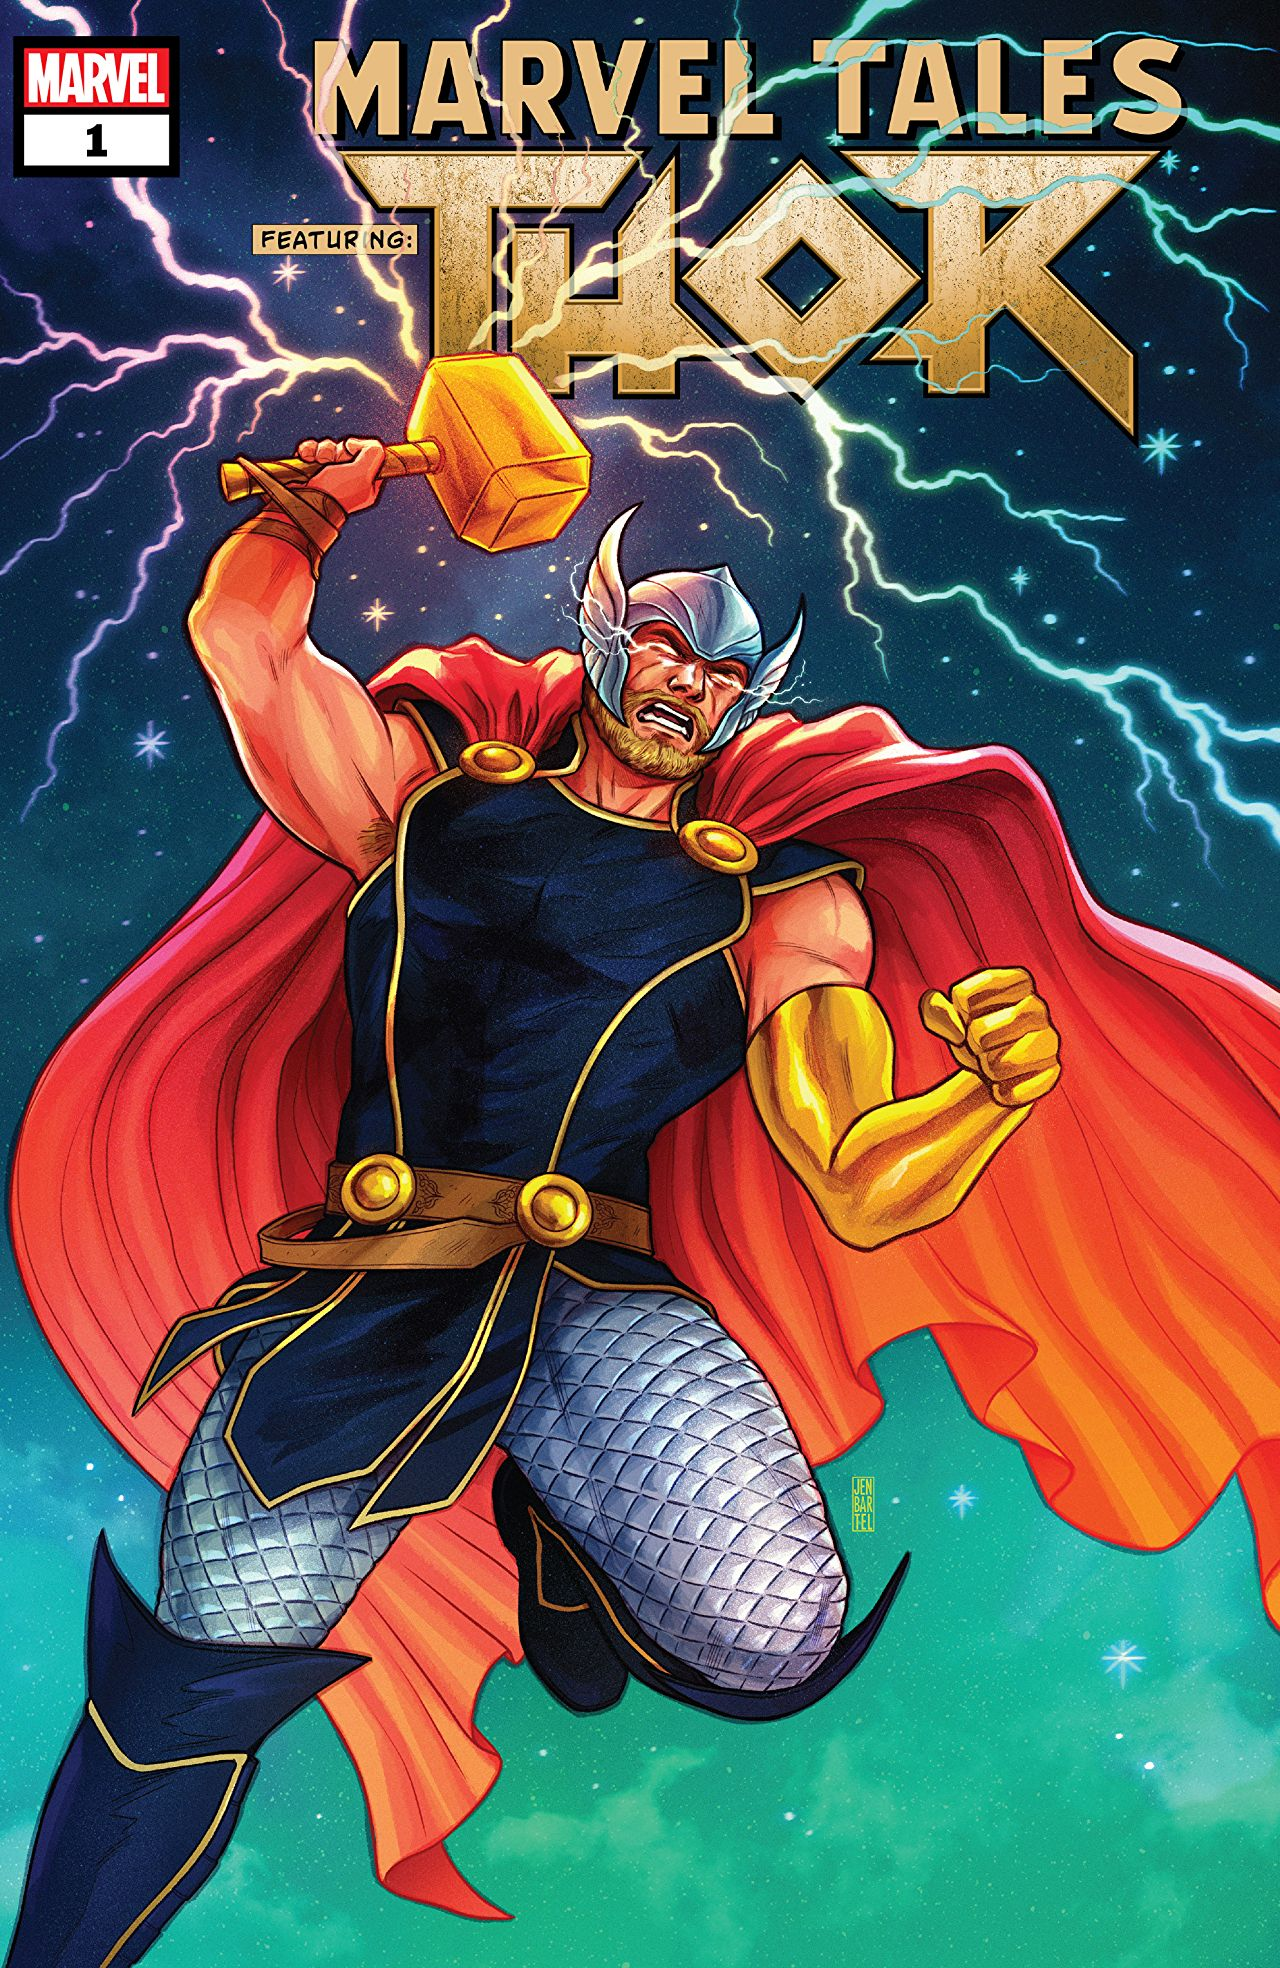 Marvel Tales: Thor Vol 1 1